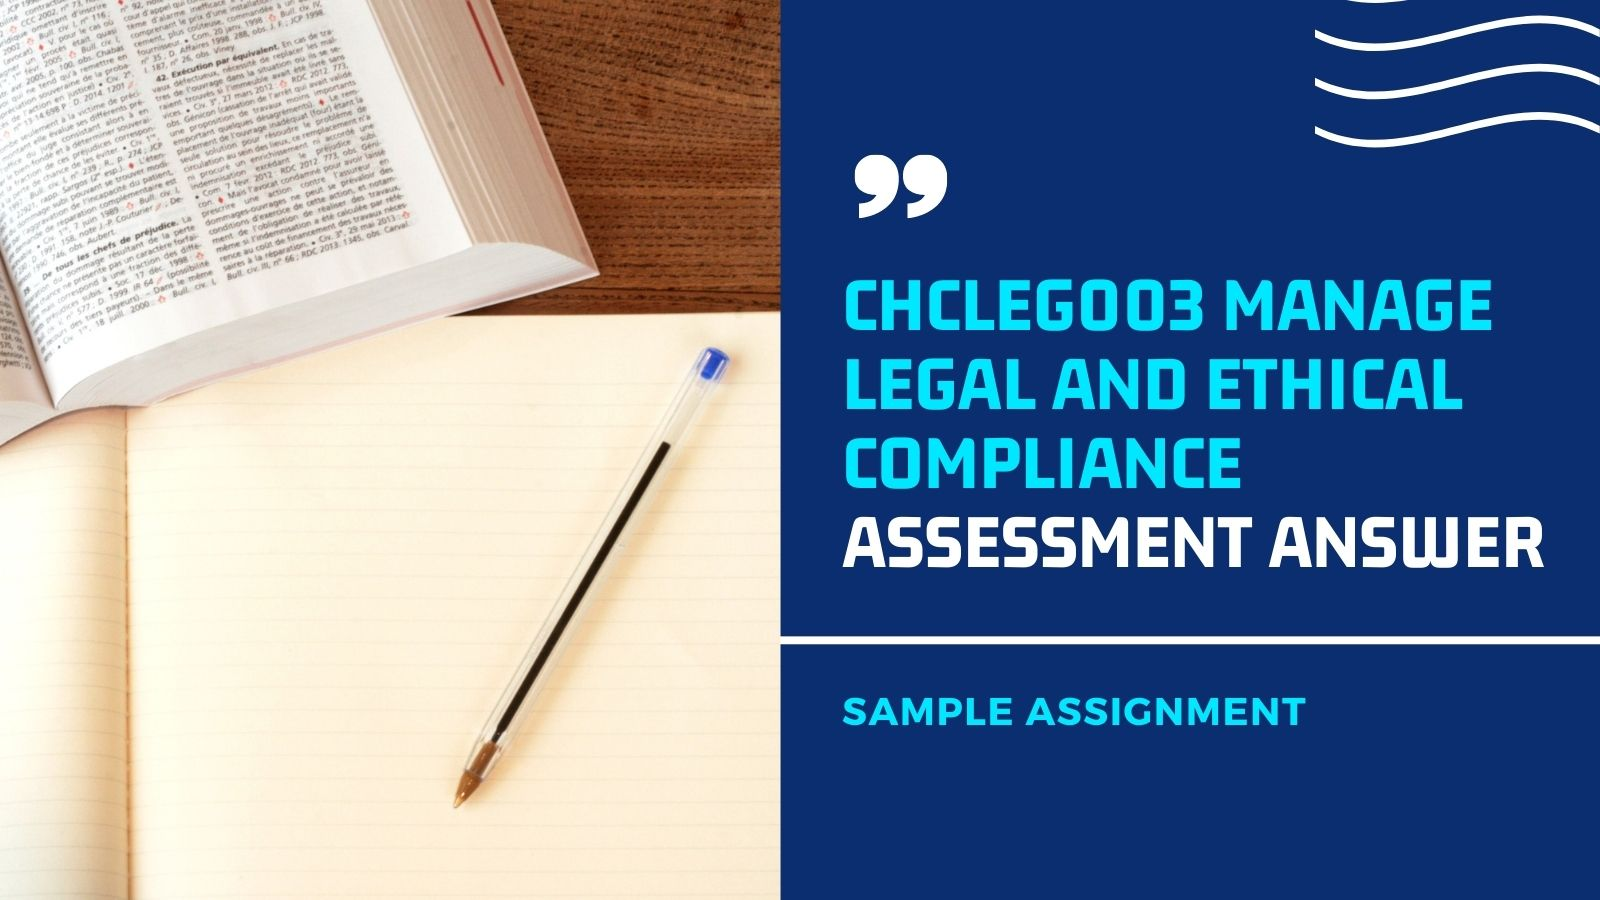 chcleg003 assessment answer